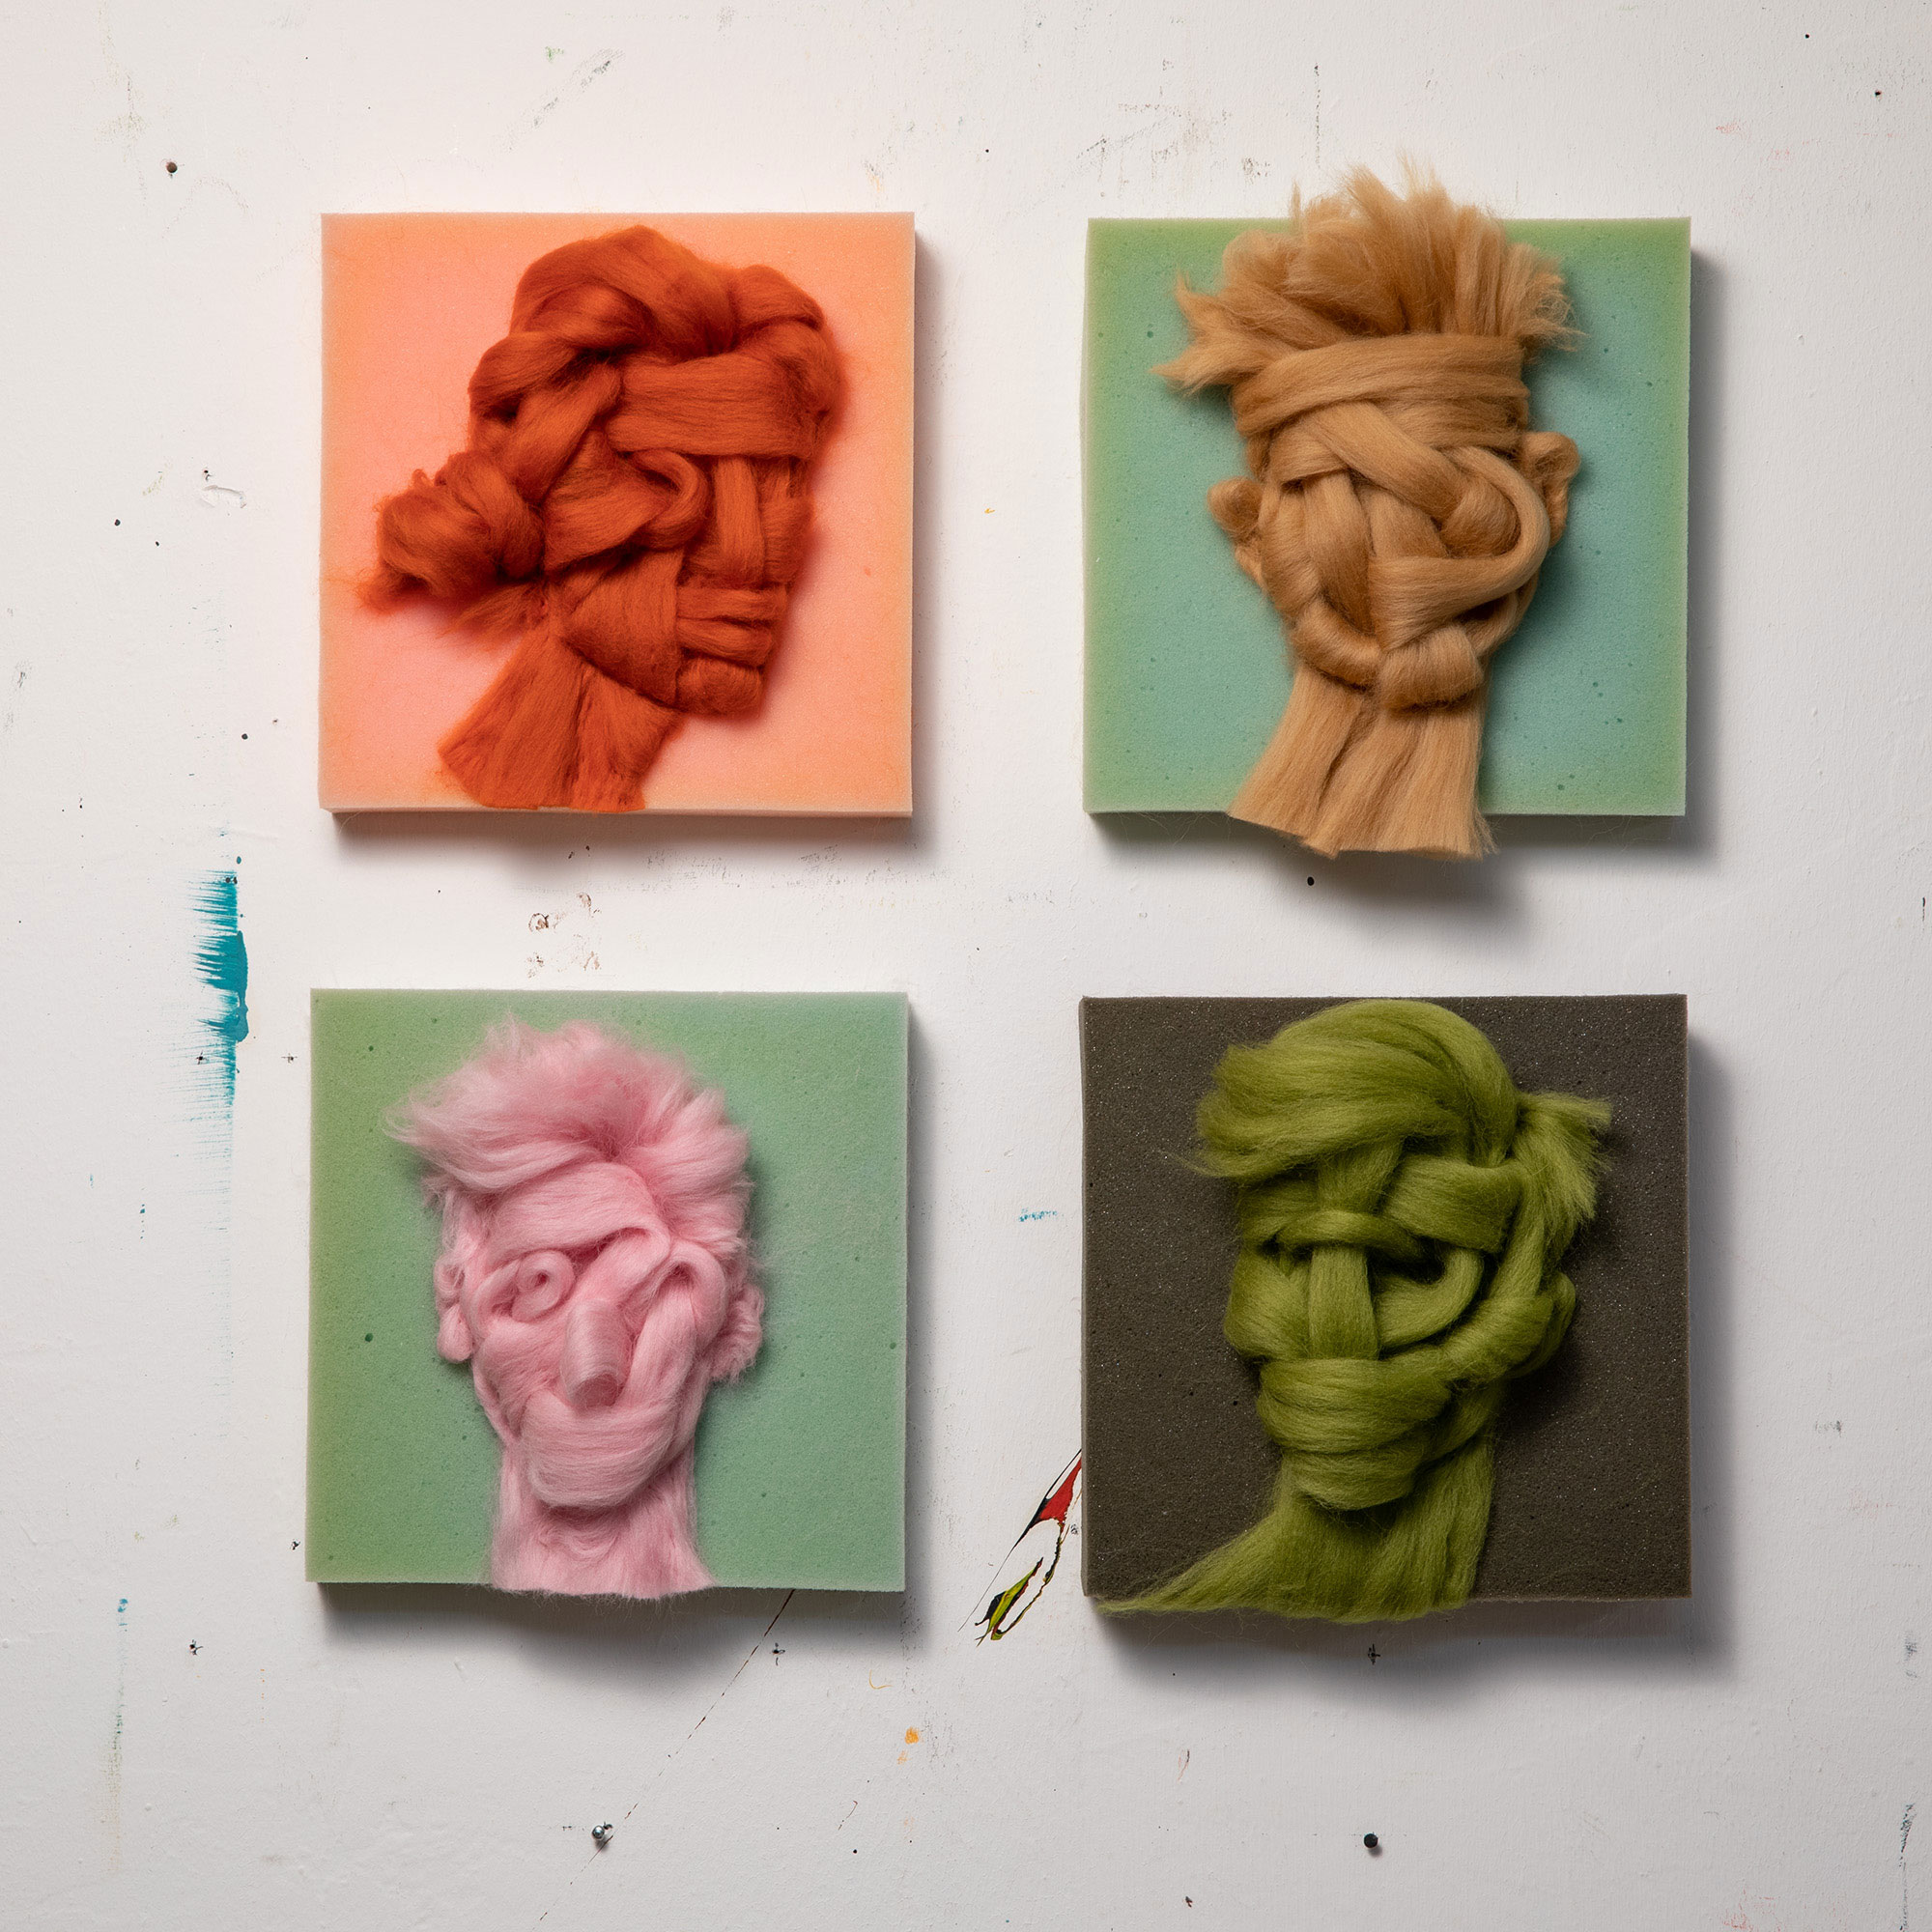 Salman Khoshroo,Wool on Foam Portraits Series, 2020. Courtesy of the artist.